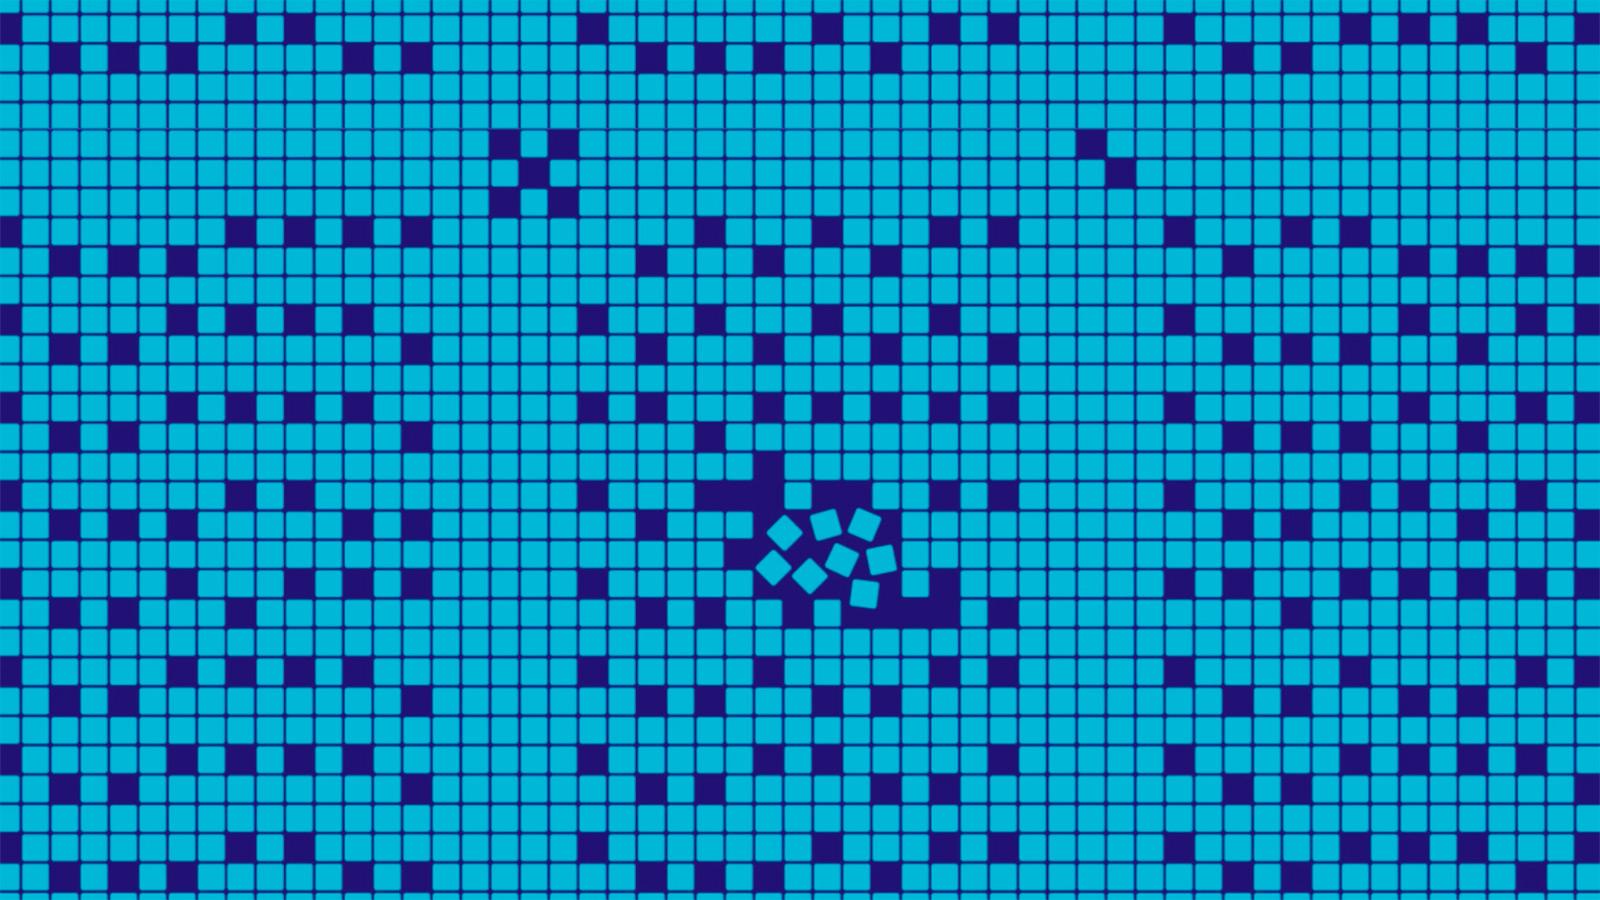 atomic_data_storagejpg